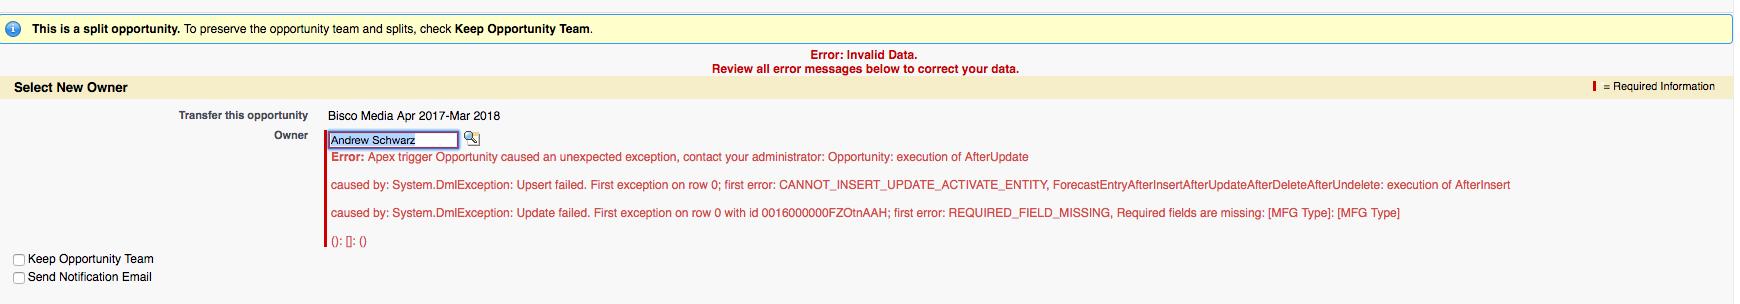 Need help with Apex error happening when updating